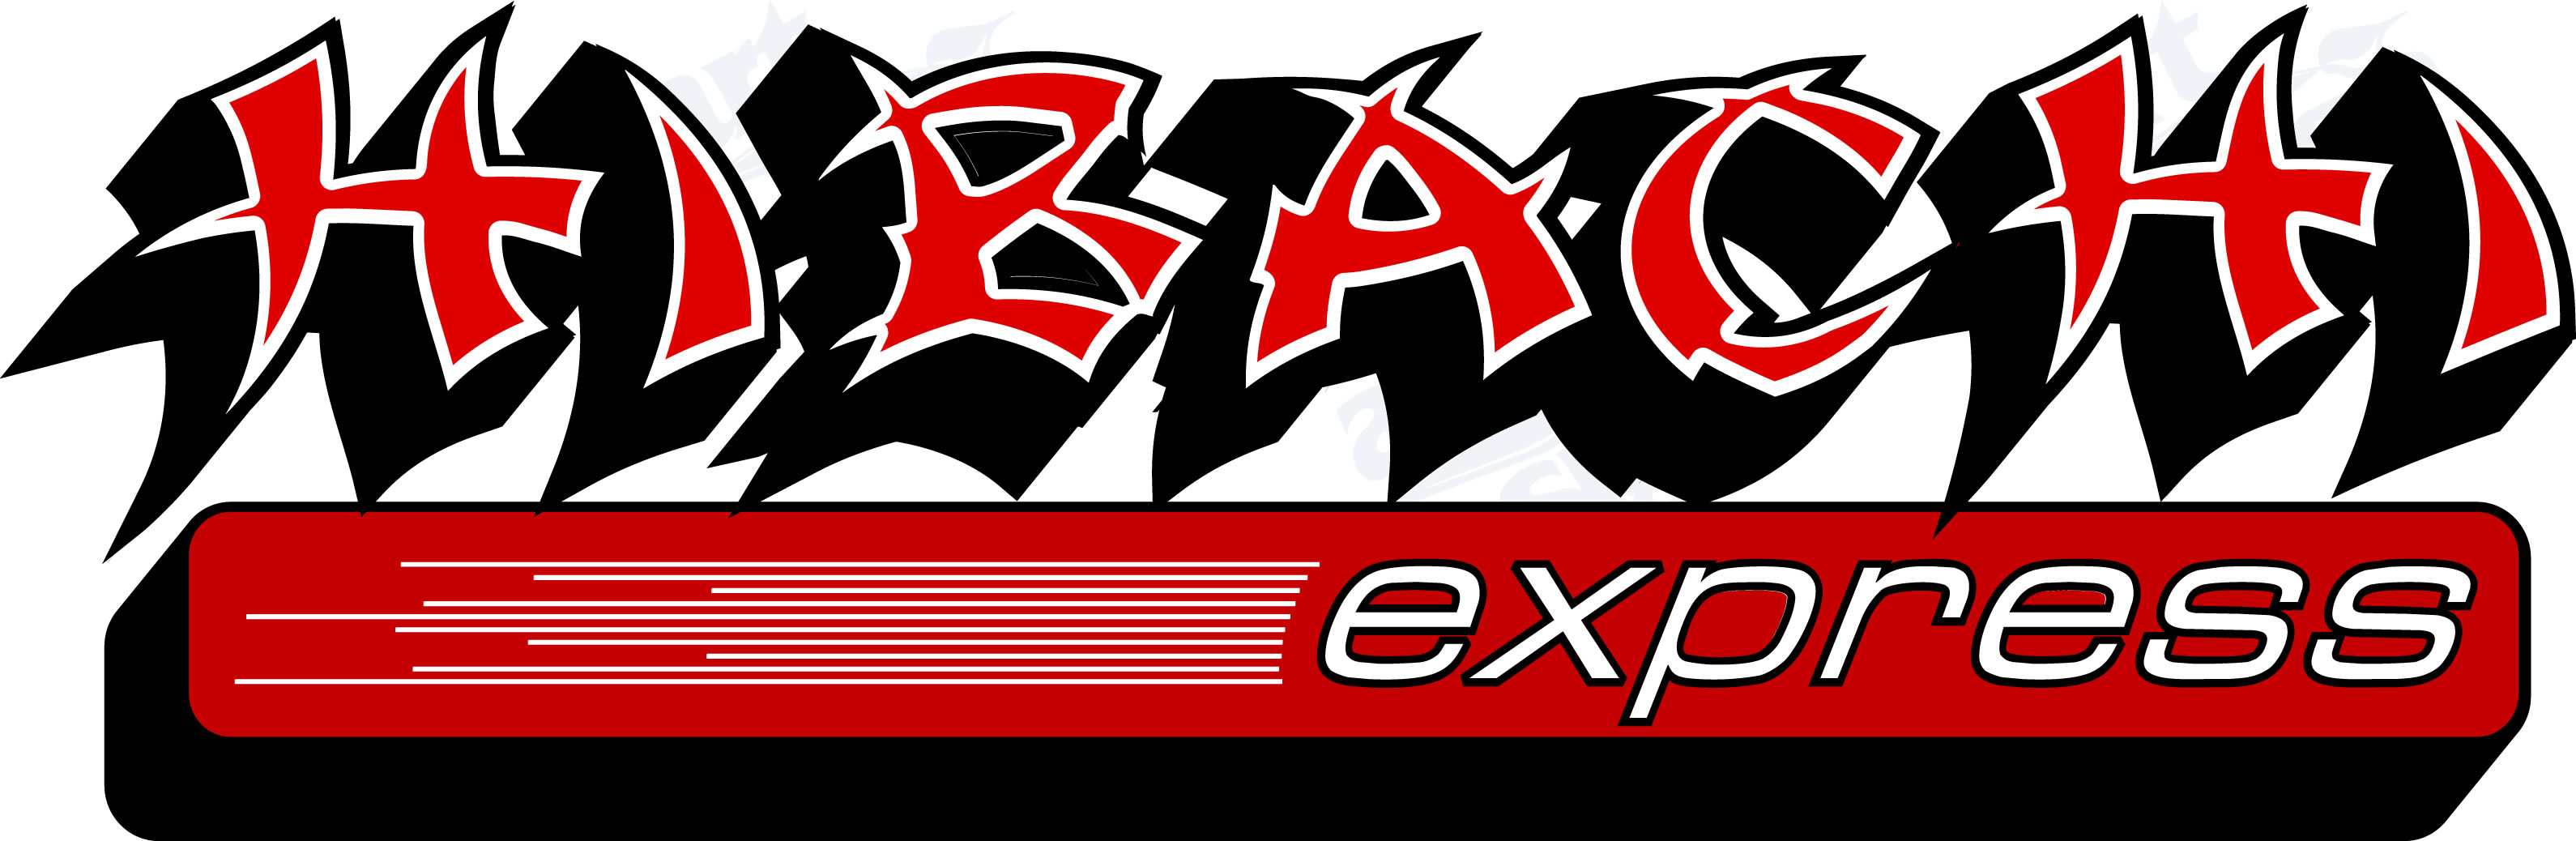 Hibachi Express logo